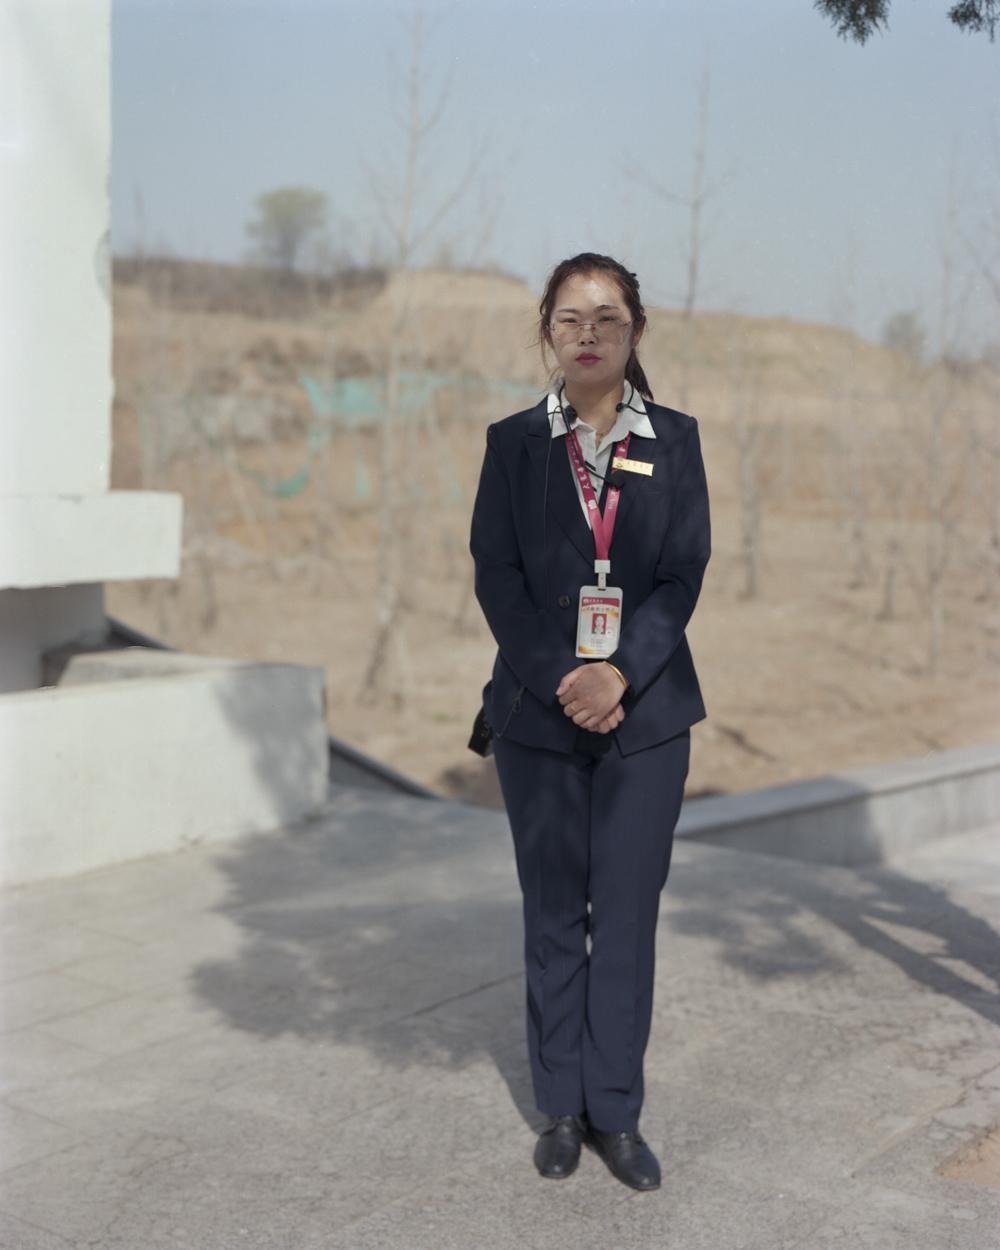 Zhao Mei works as a tour guide in Dazhai Village, Shanxi province, April 20, 2021. Shi Yangkun/Sixth Tone